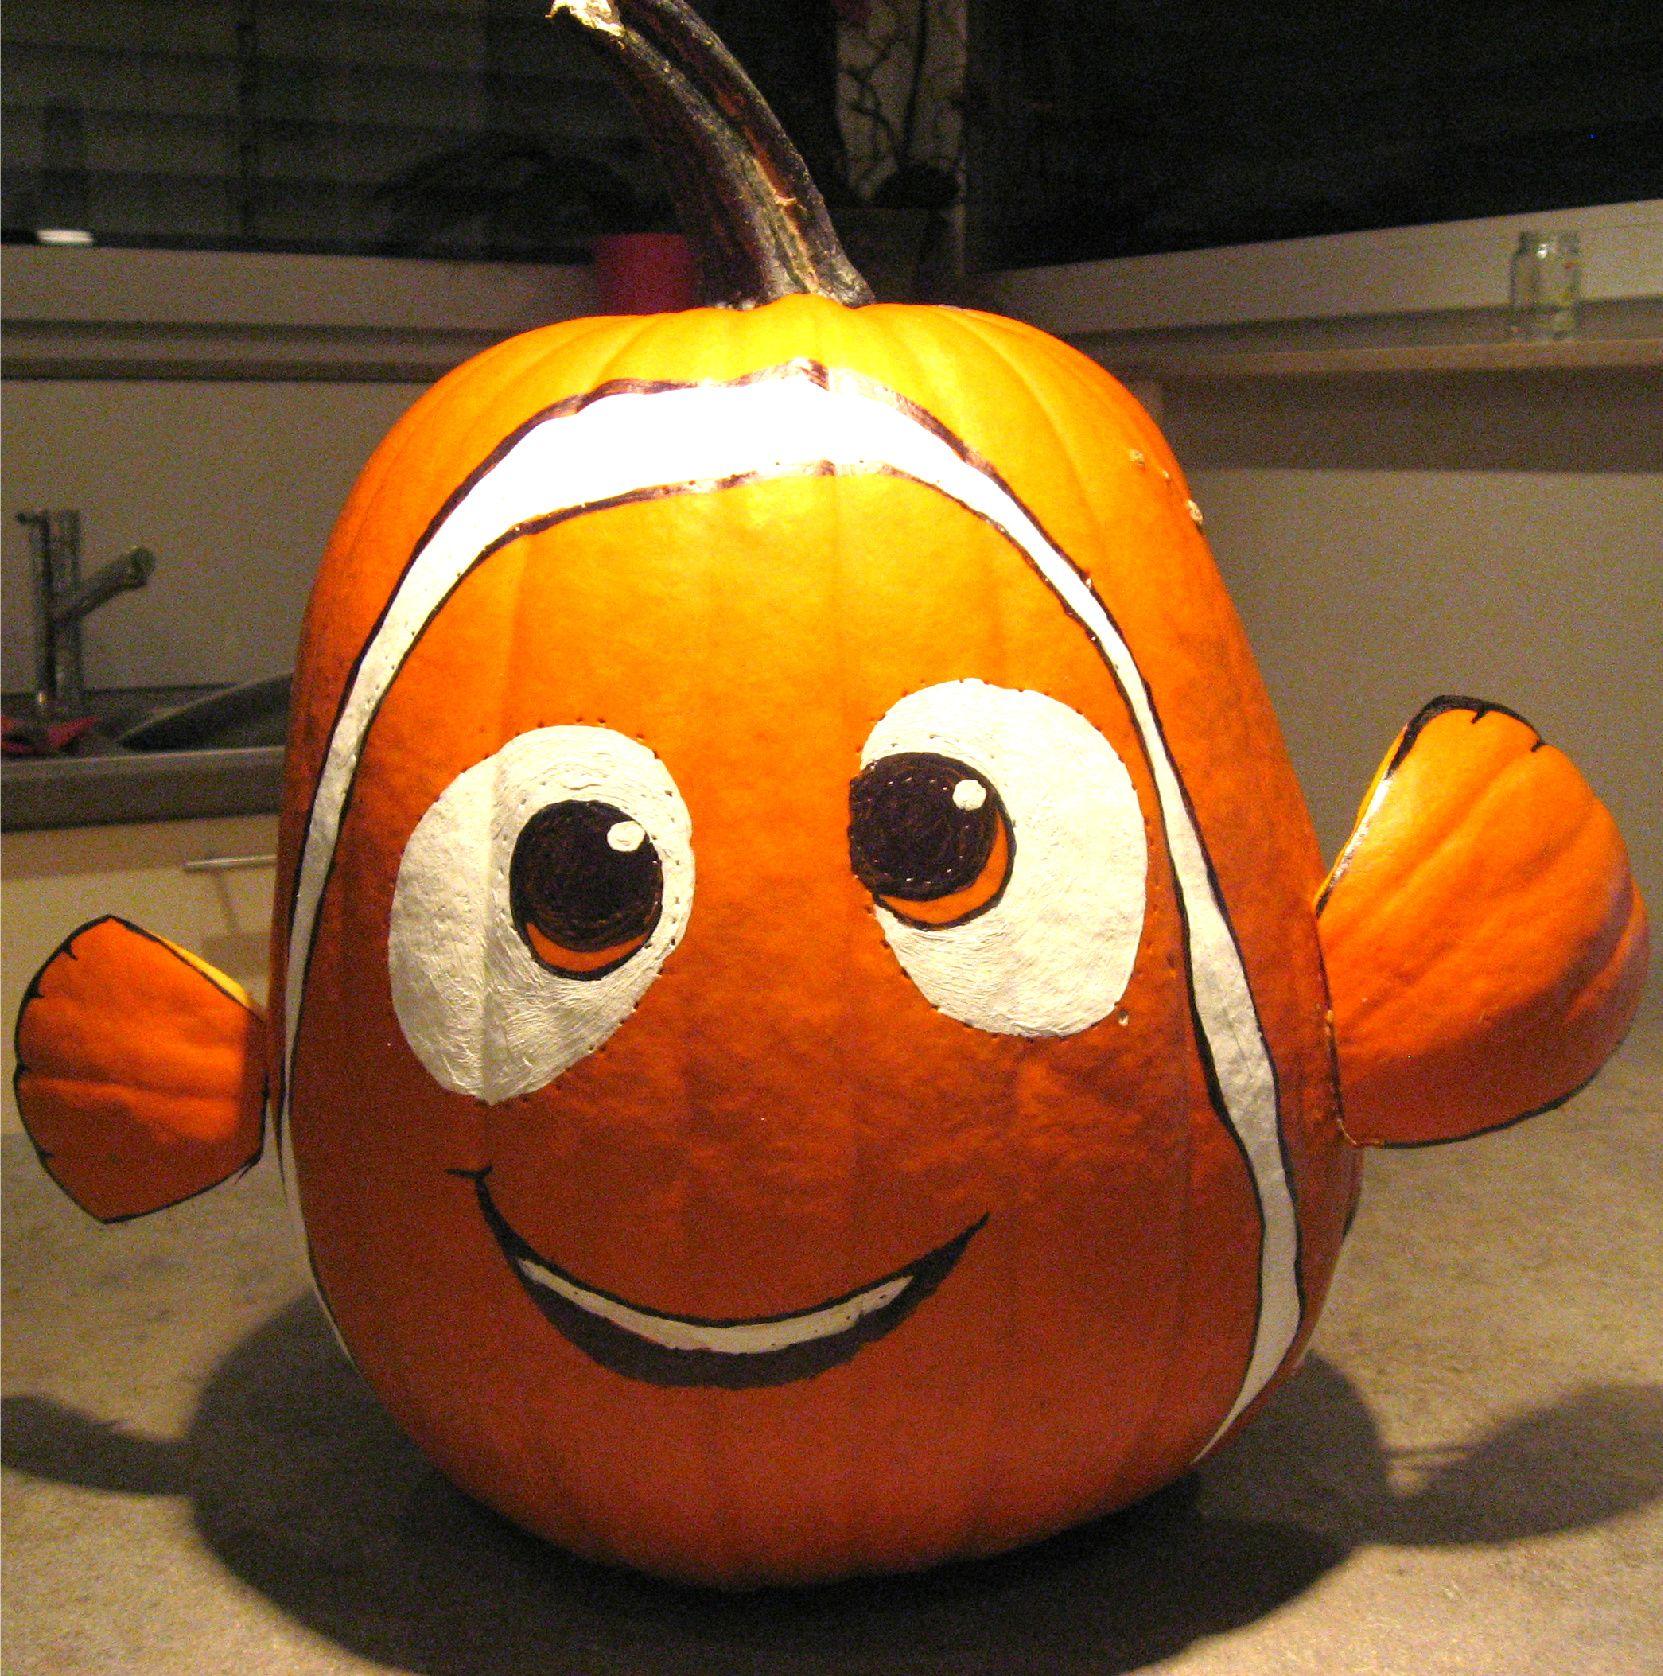 Fantastic jack o lantern pumpkin carving ideas to inspire you